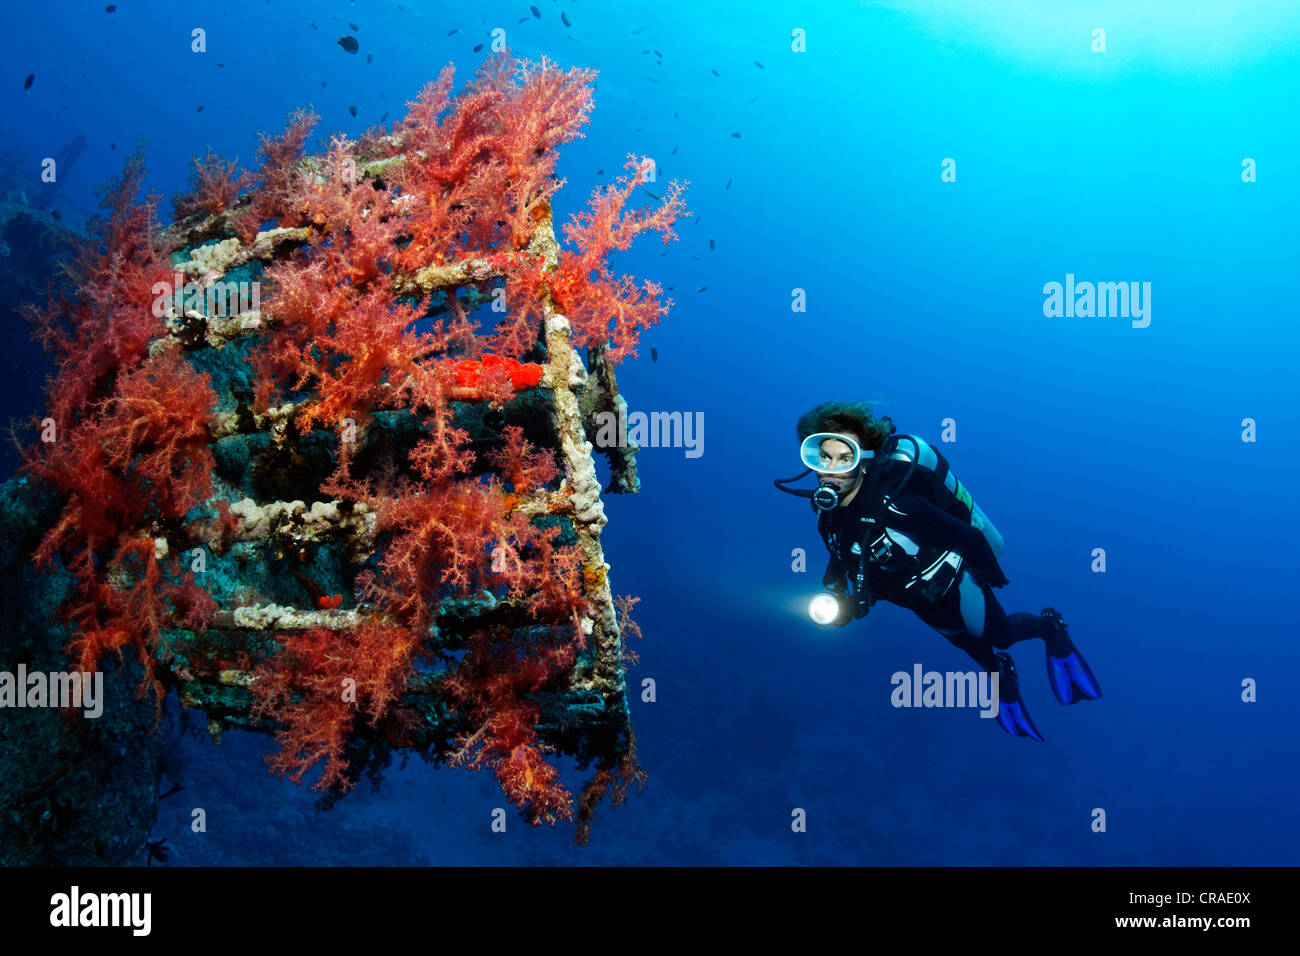 En Lookout overcrusted buzo con vibrantes Dendronephthya klunzingeri brócoli (coral), naufragios, Cedar Pride, Imagen De Stock